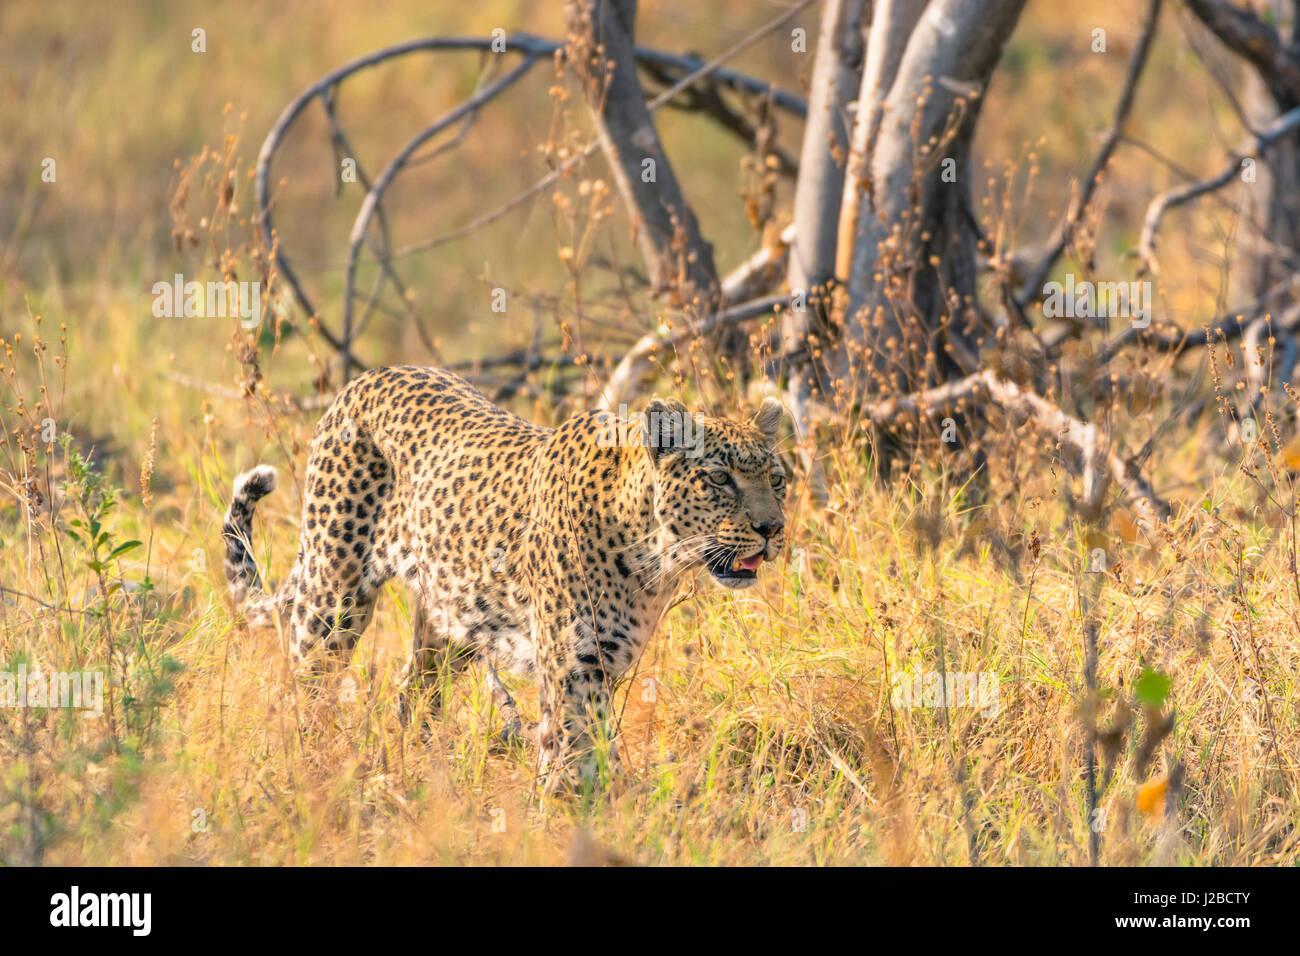 Botswana. Okavango Delta. Khwai Concession. Female leopard (Panthera pardus) in the tall grass. - Stock-Bilder